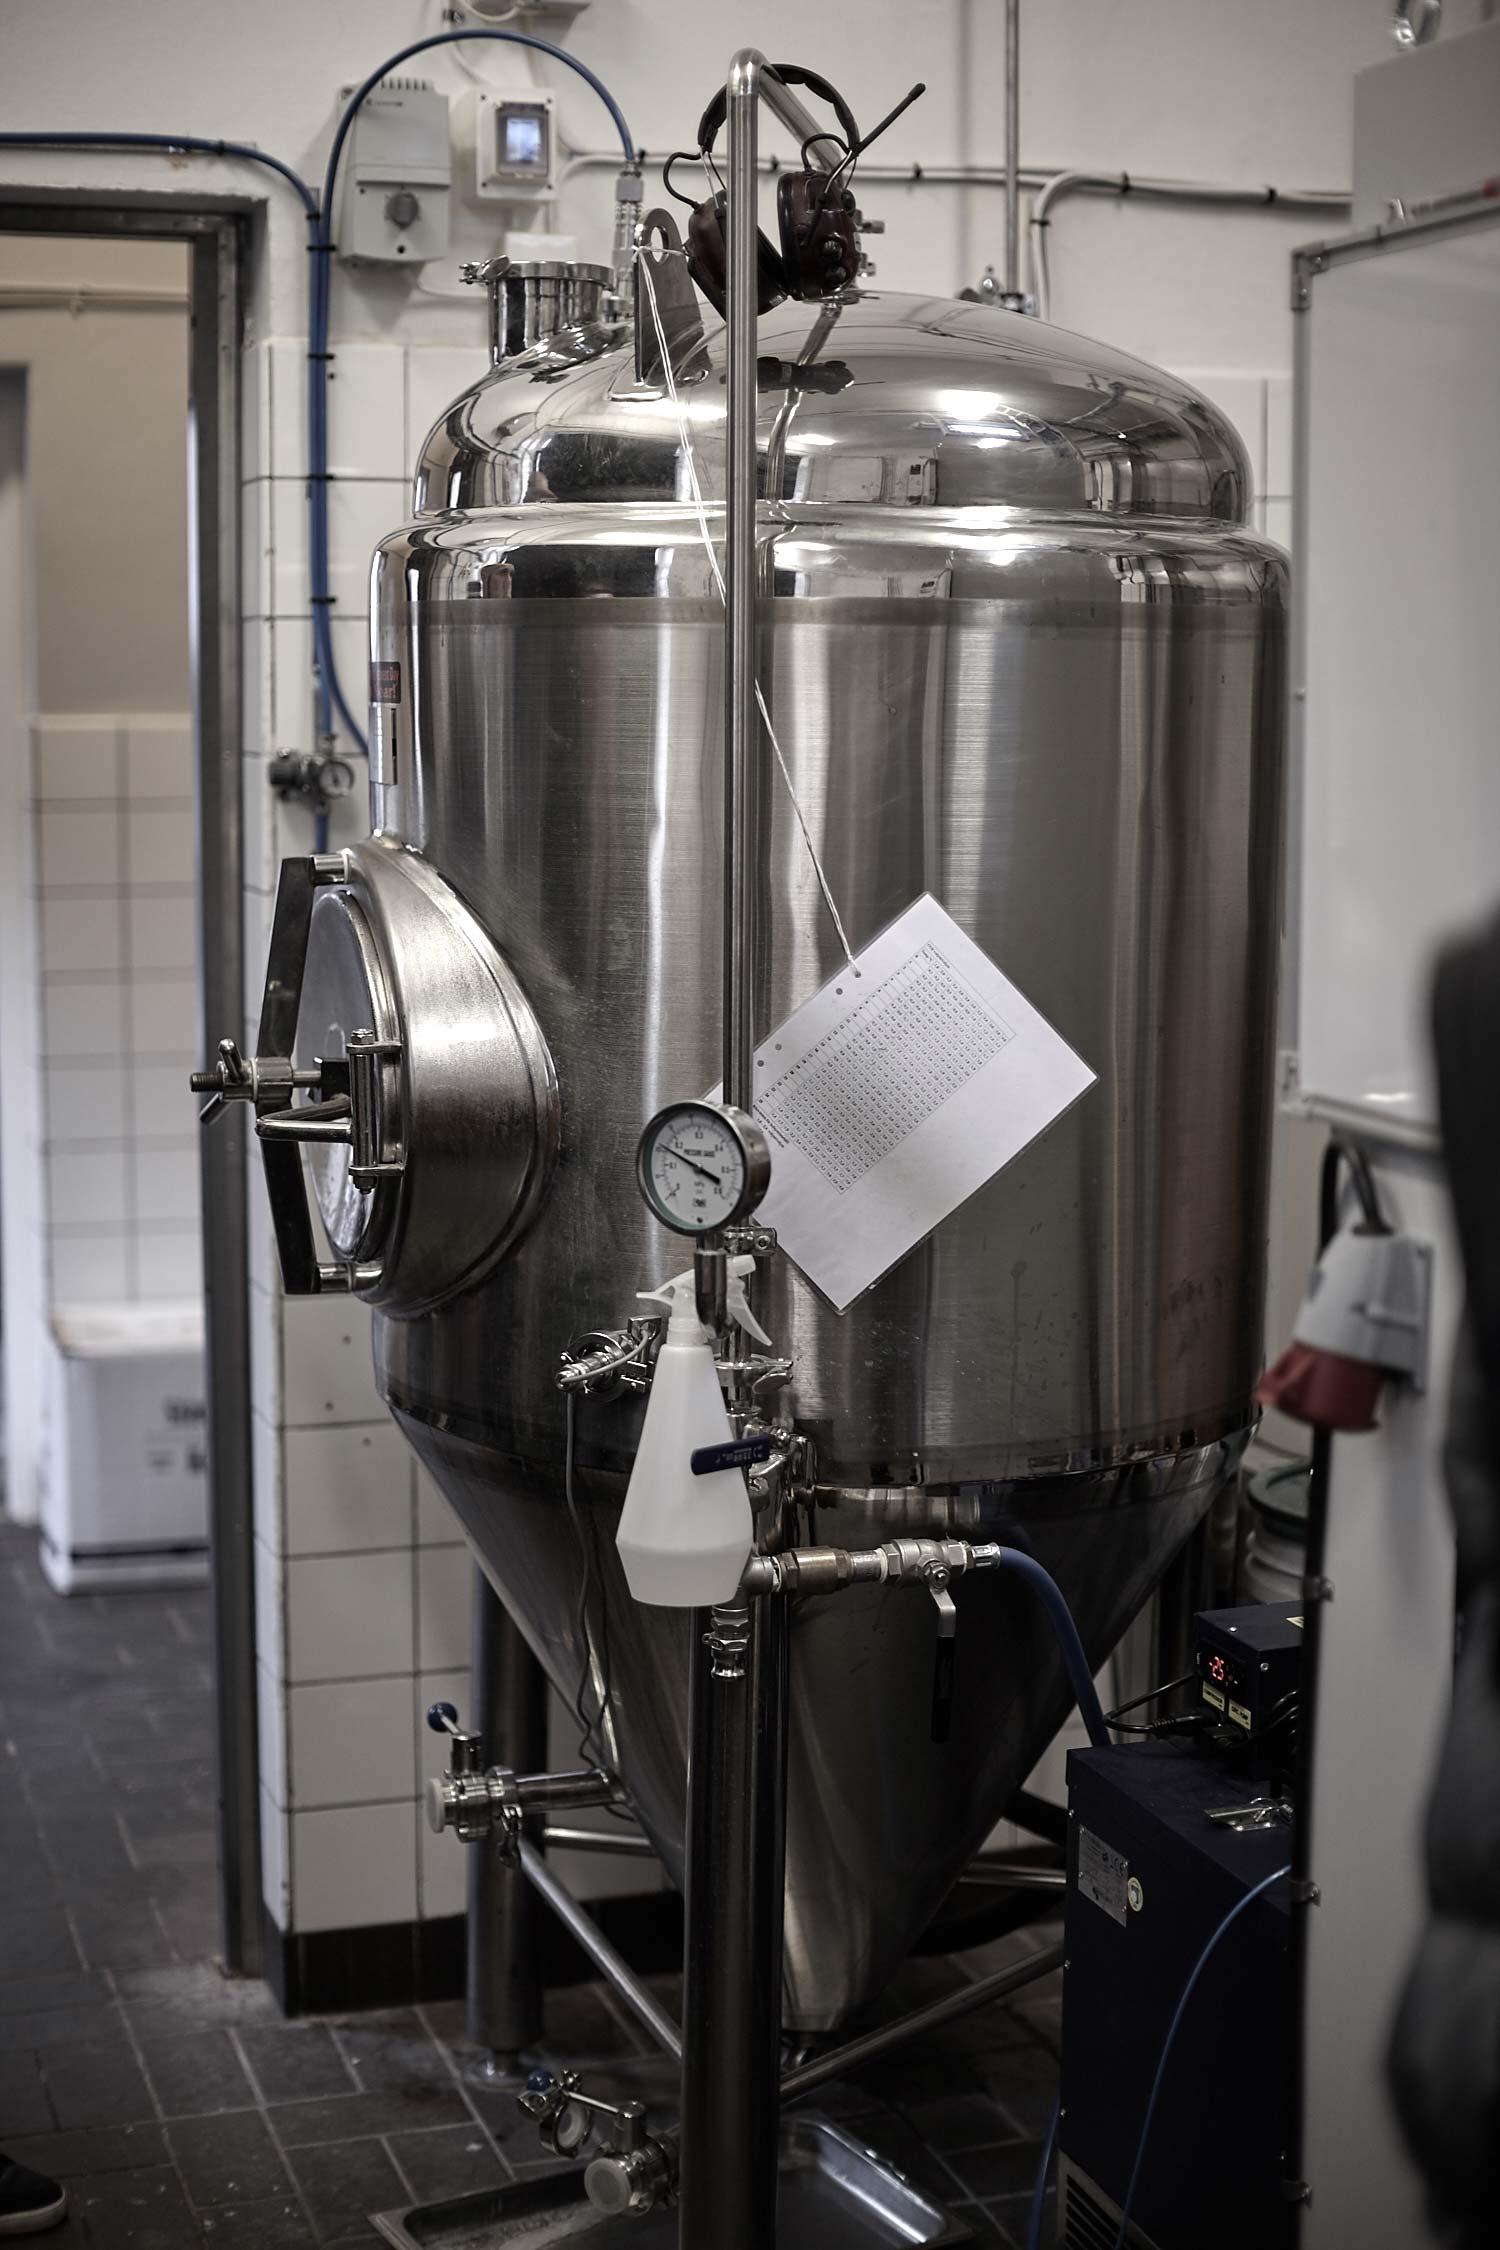 141221_norrkopings_bryggeri_aktiebolag_0022